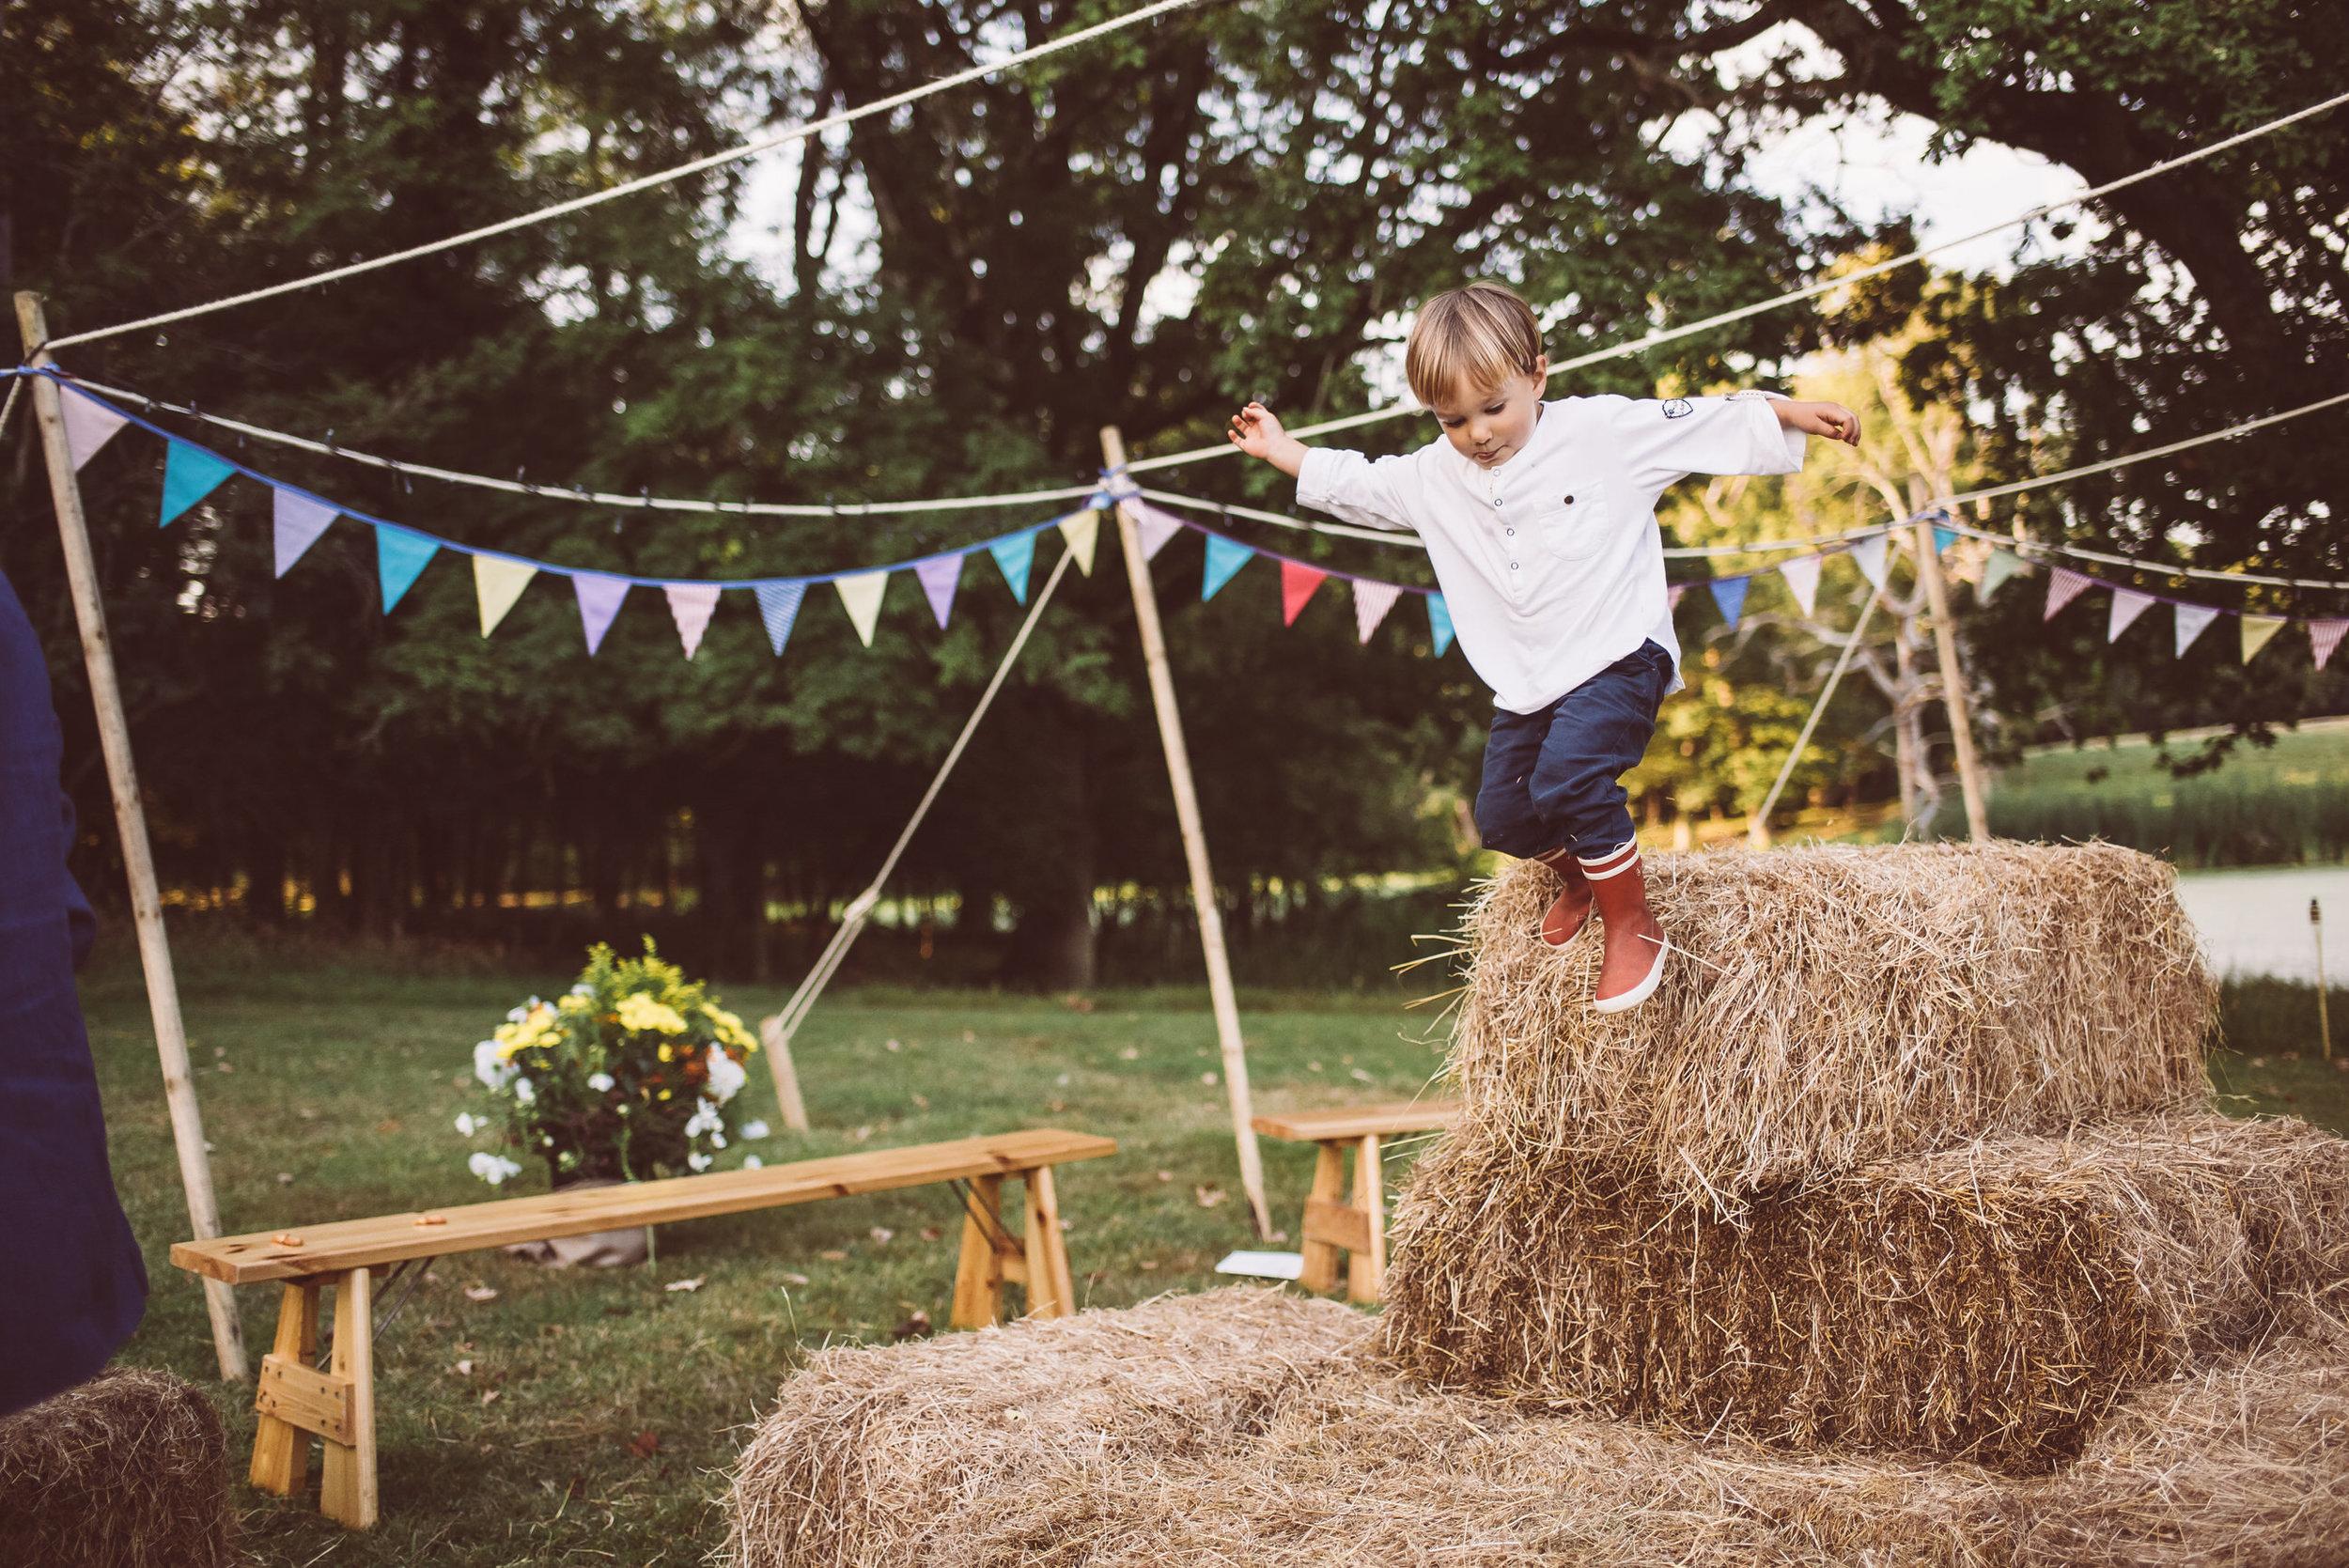 knepp-castle-boho-outdoor-wedding-518.jpg